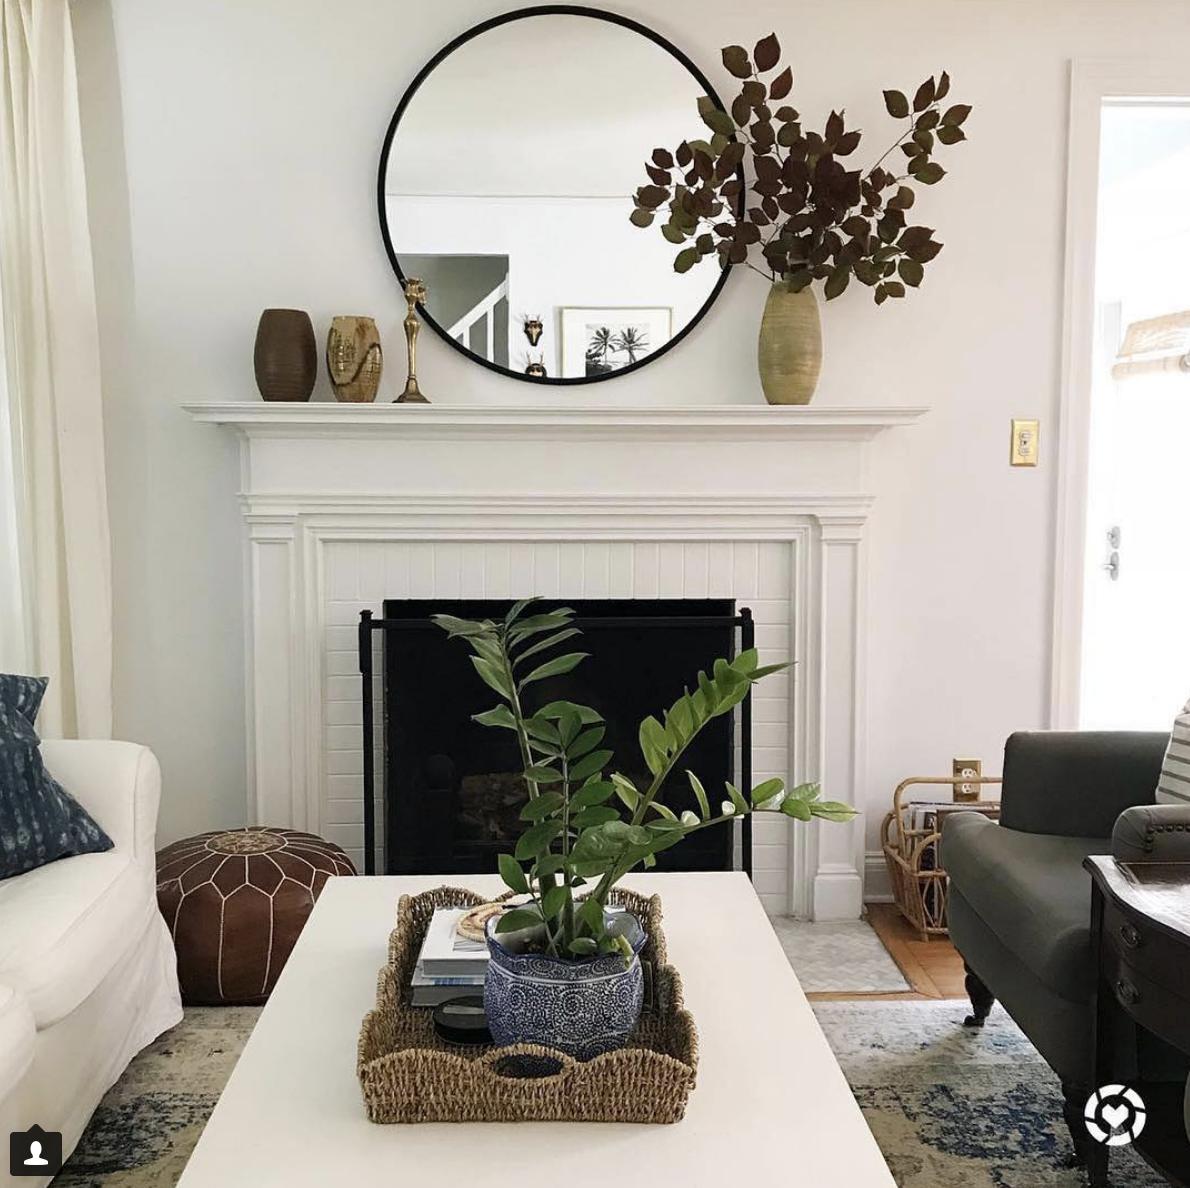 Black Circle Mirror Mantle Decor Fireplace Mantle Decor Living Room Green Fireplace Mantel Decor